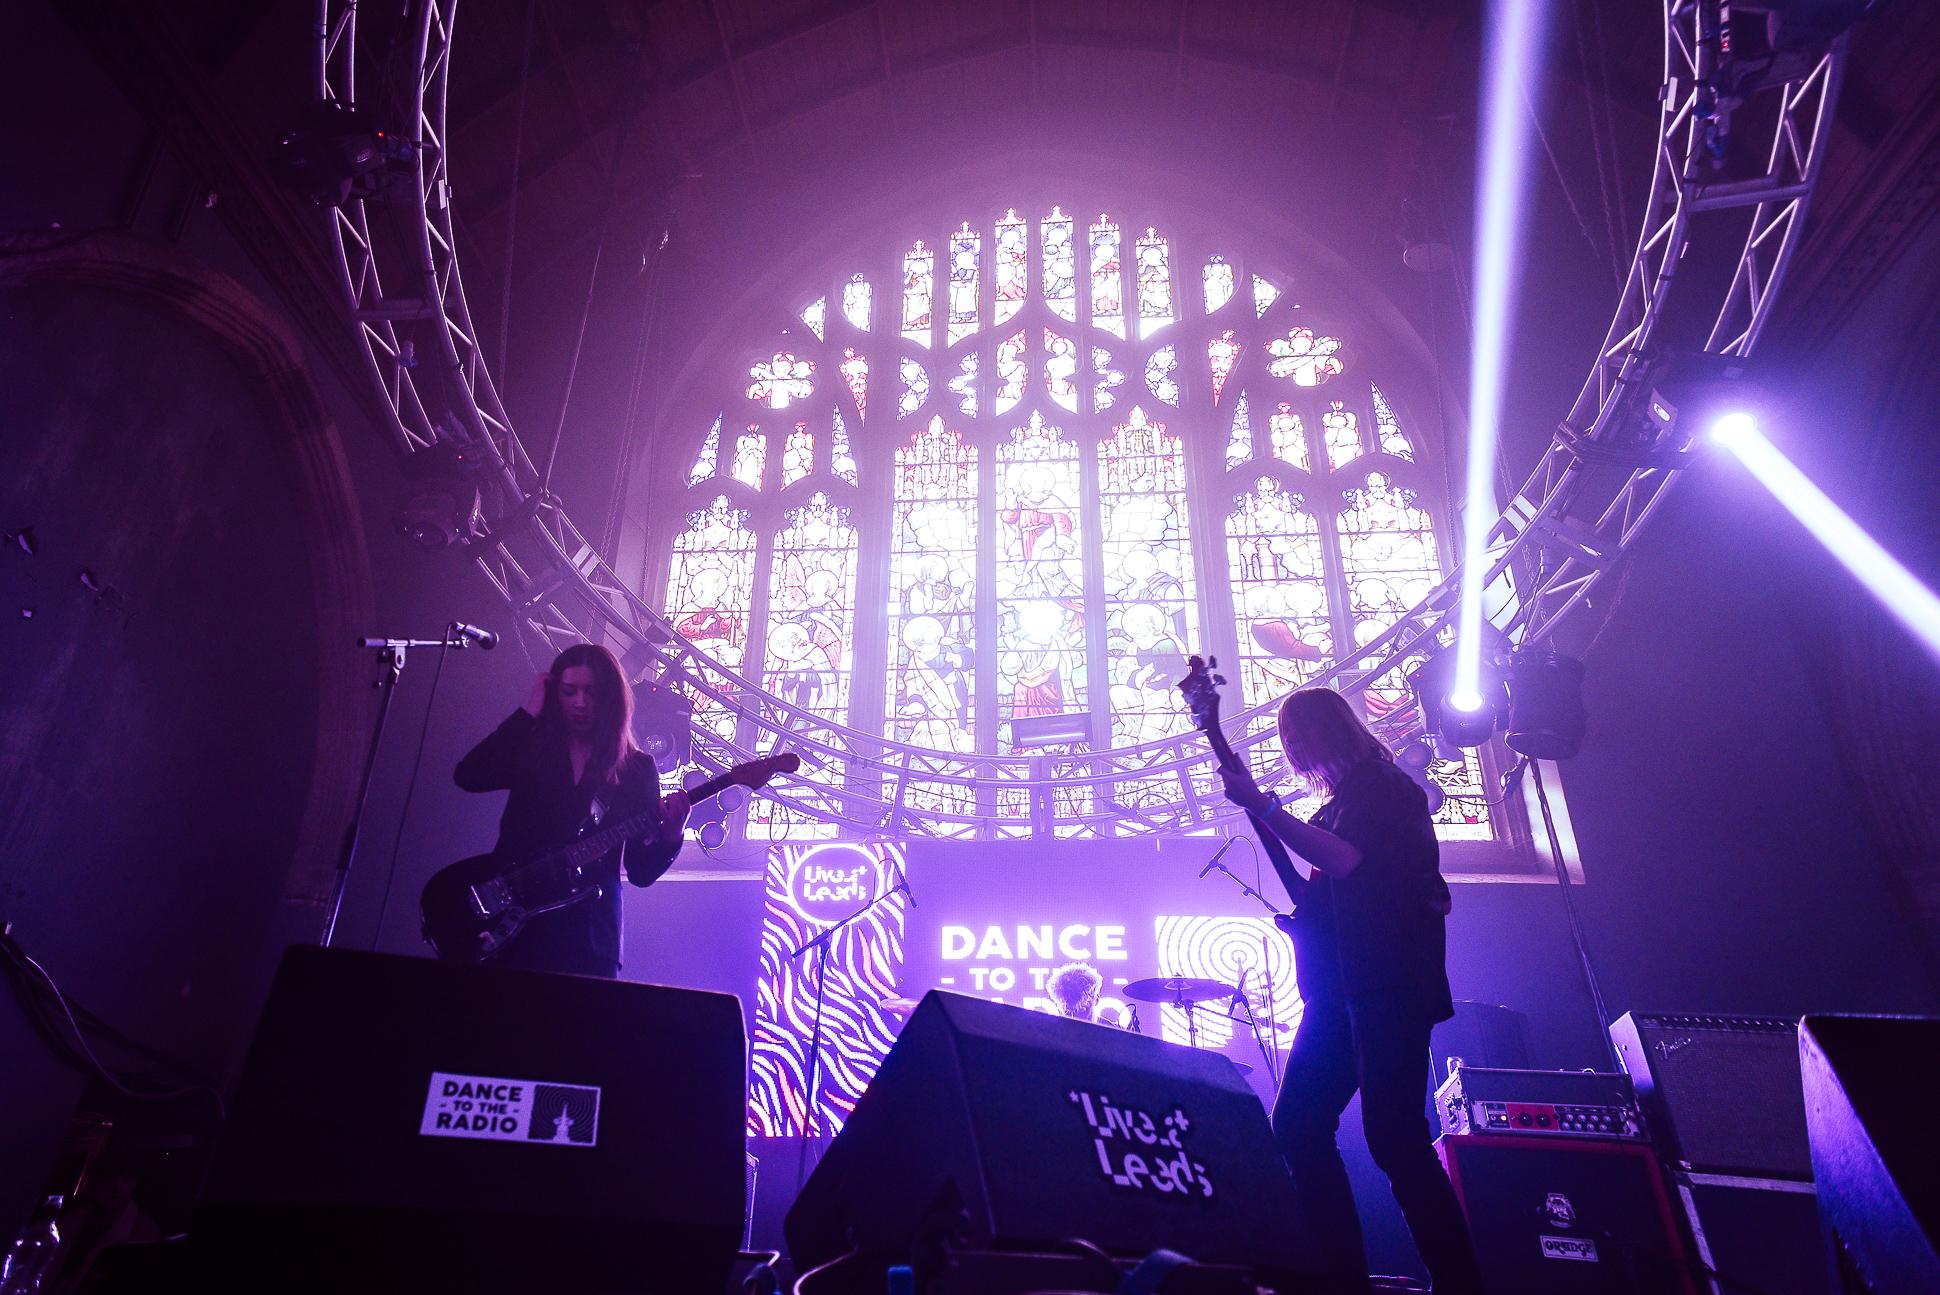 Live At Leeds 2019 - The Mysterines-3.jpg